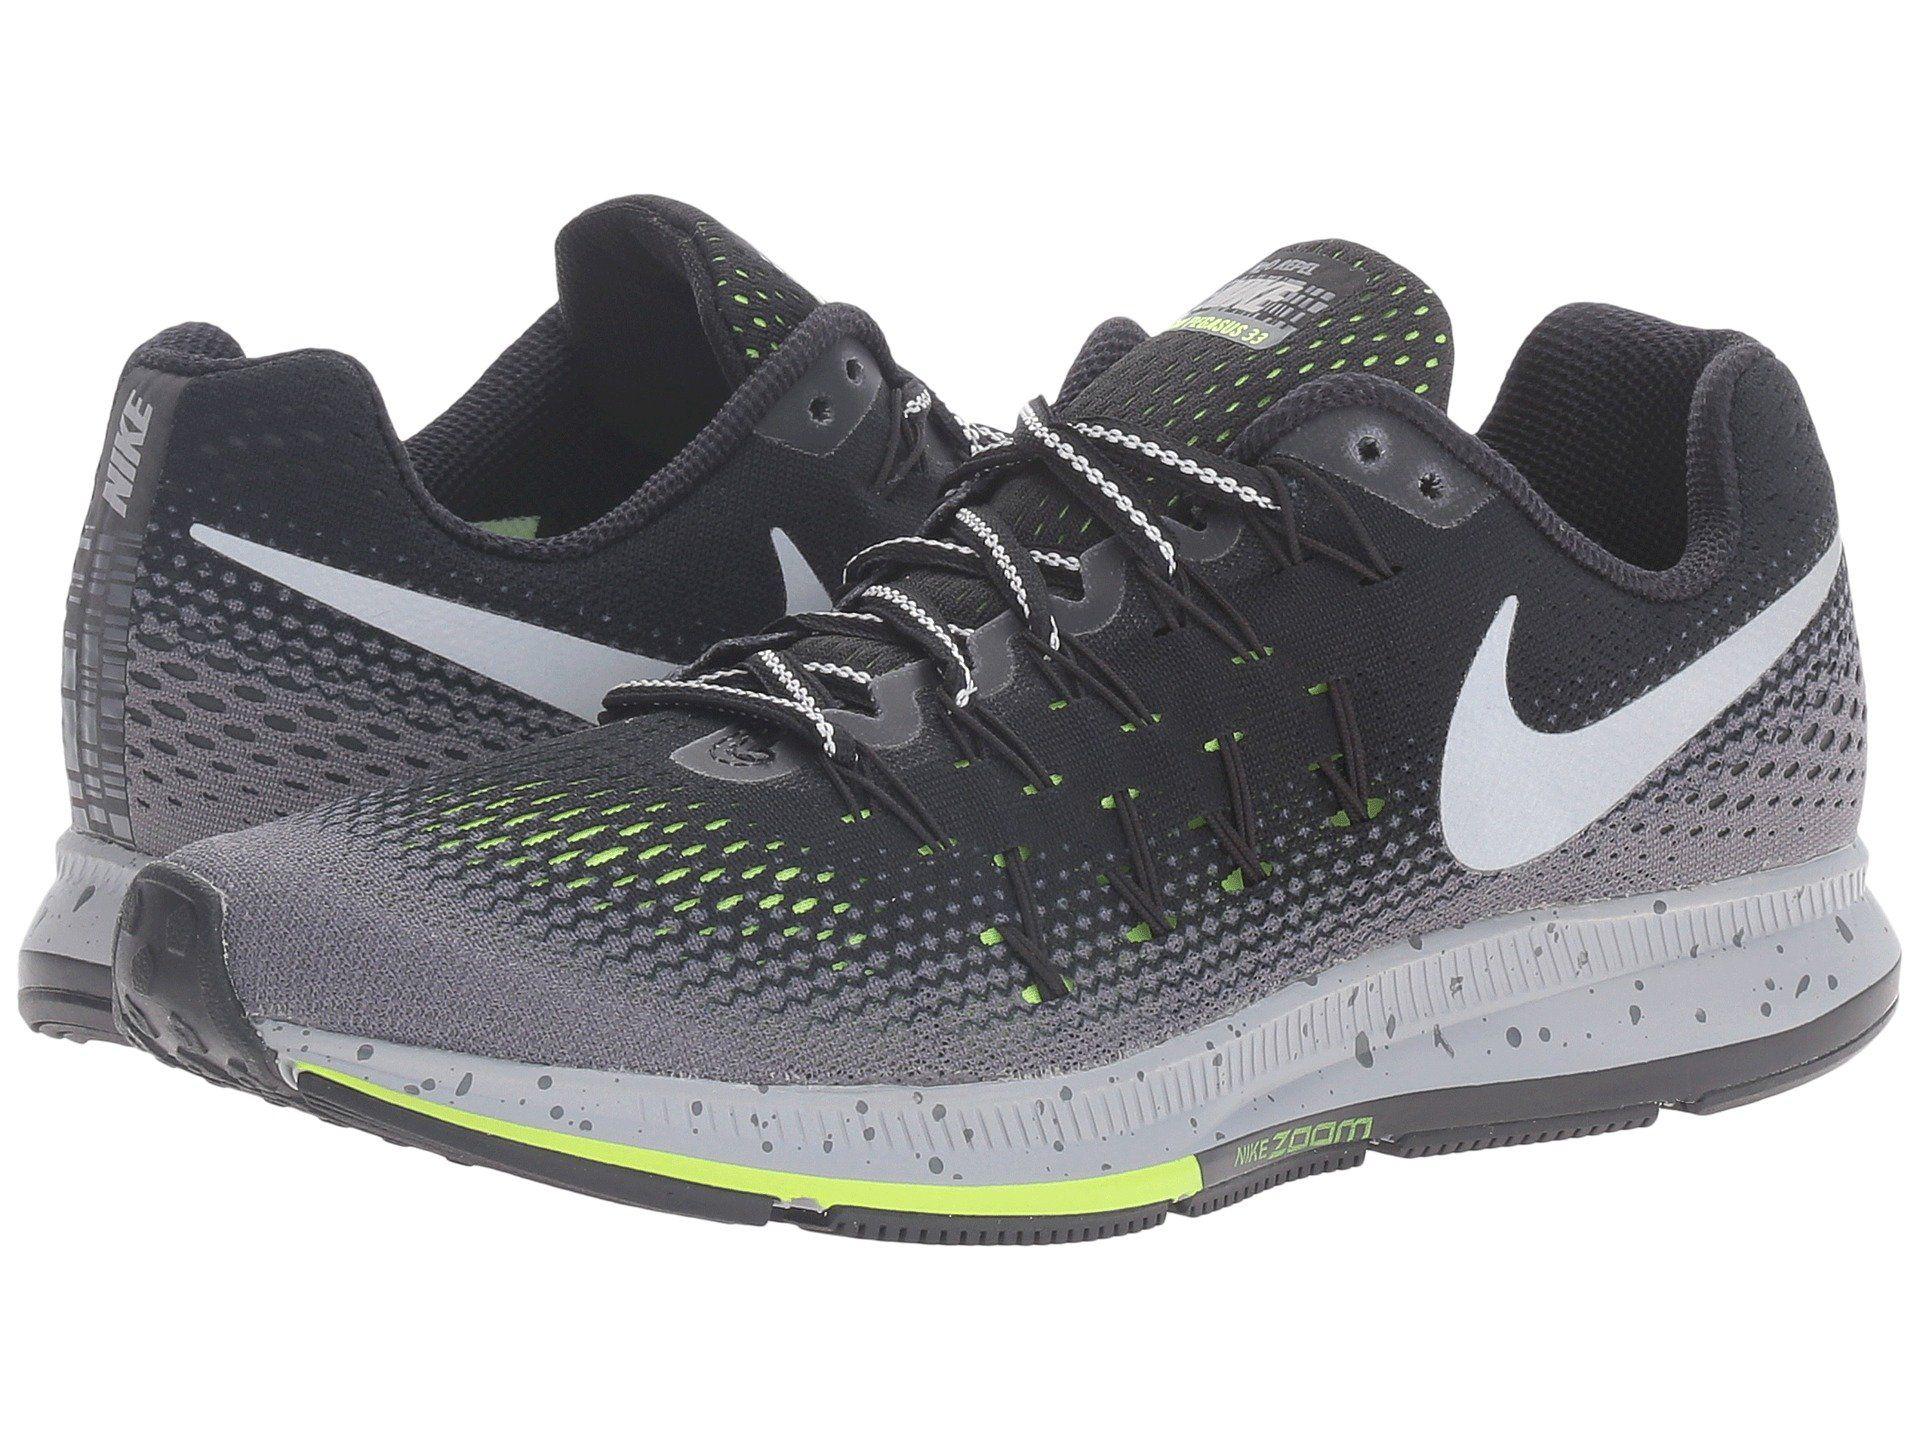 wholesale dealer c0ac6 70951 NIKE Air Zoom Pegasus 33 Shield. #nike #shoes # | Nike ...